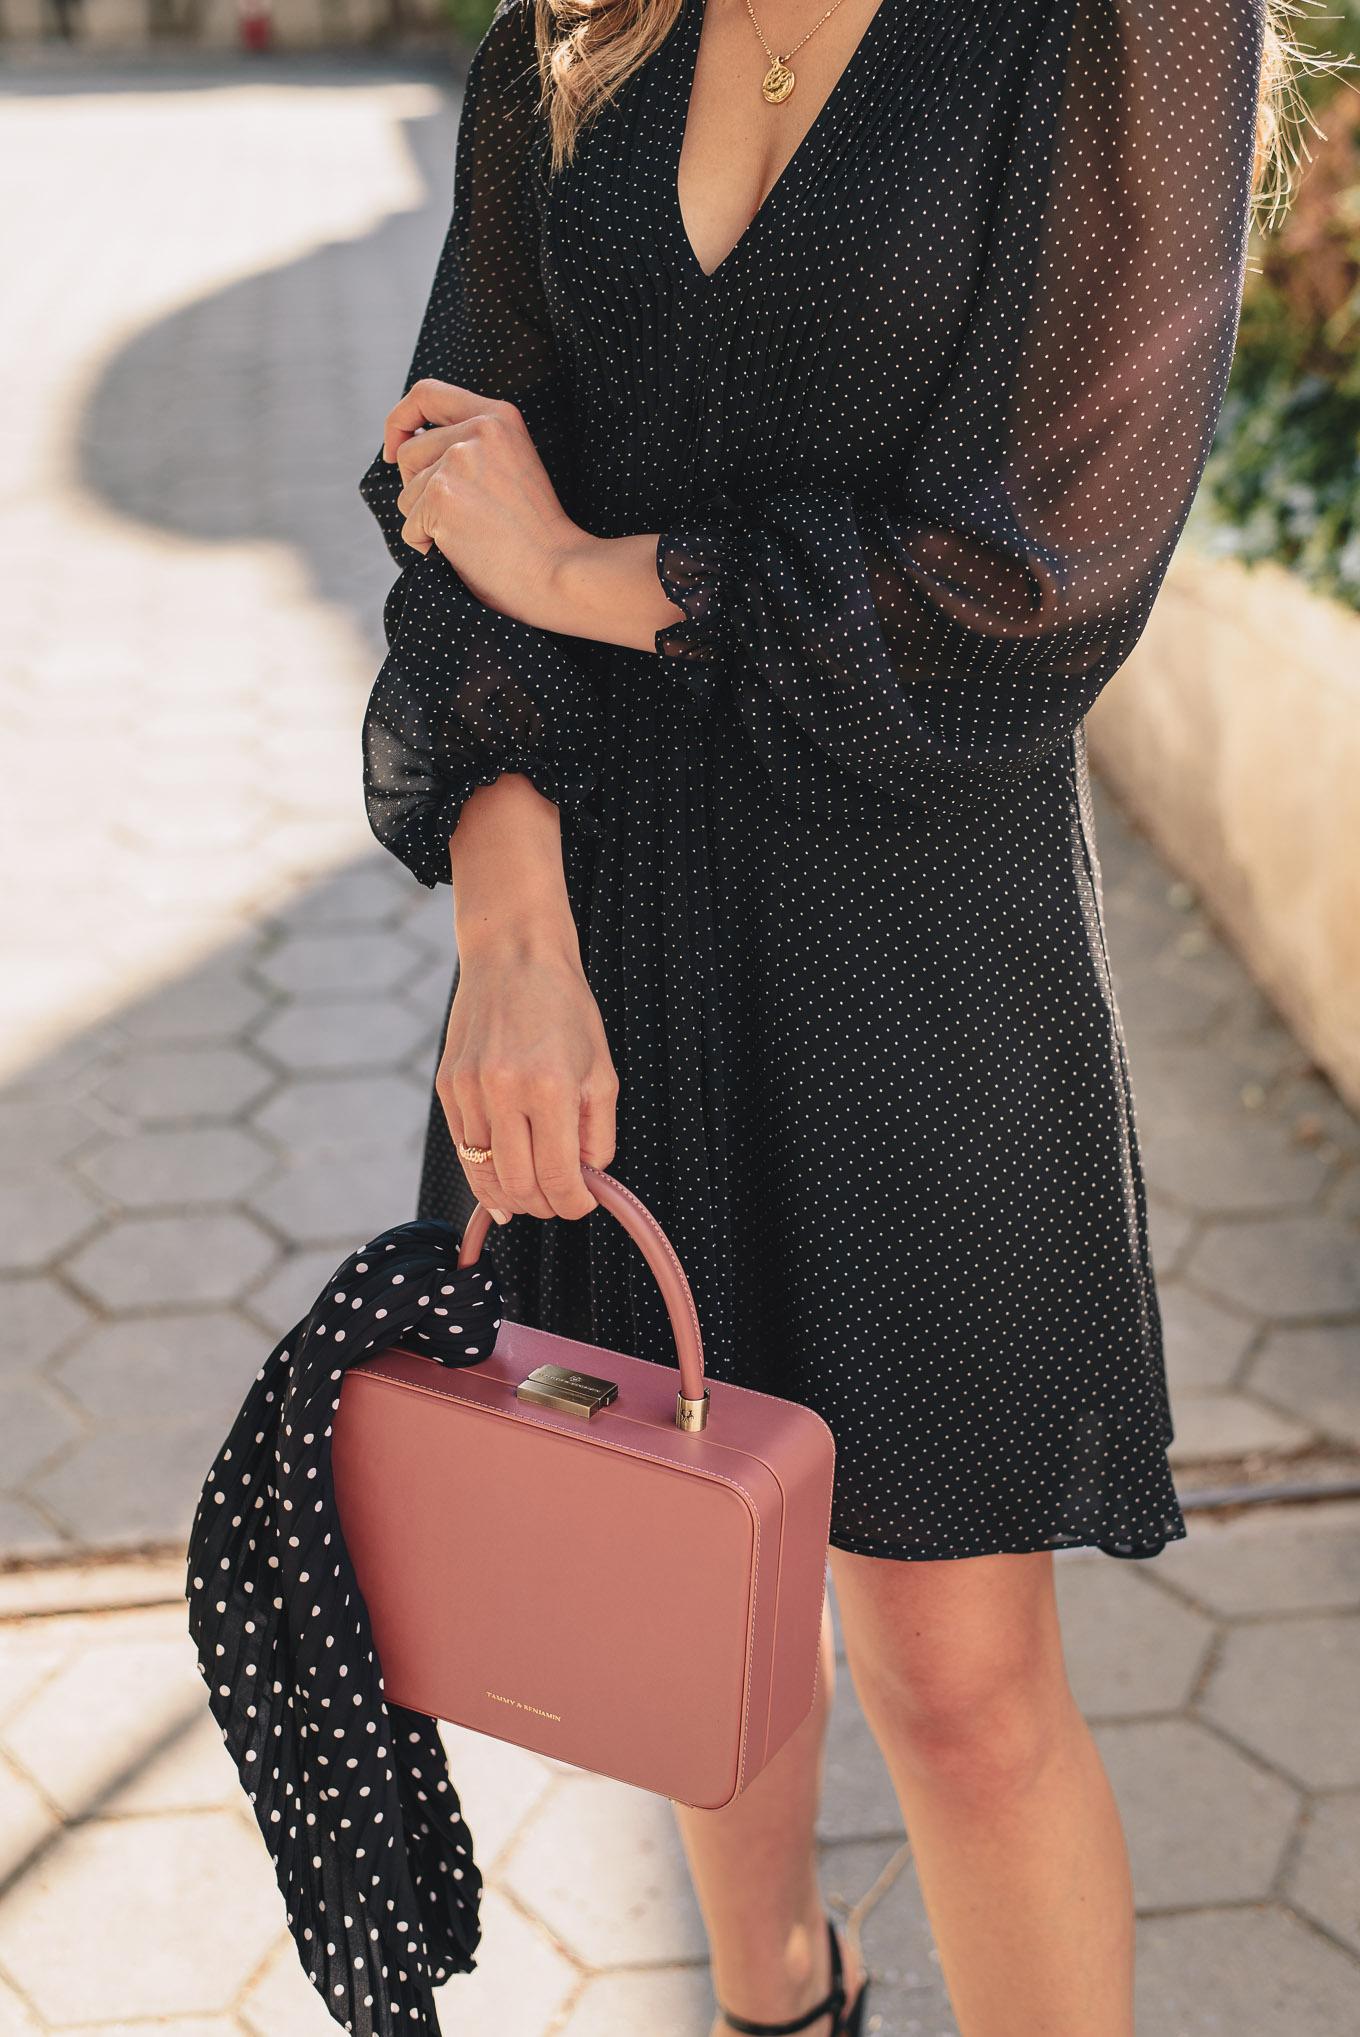 Tammy and Benjamin luxury handbag